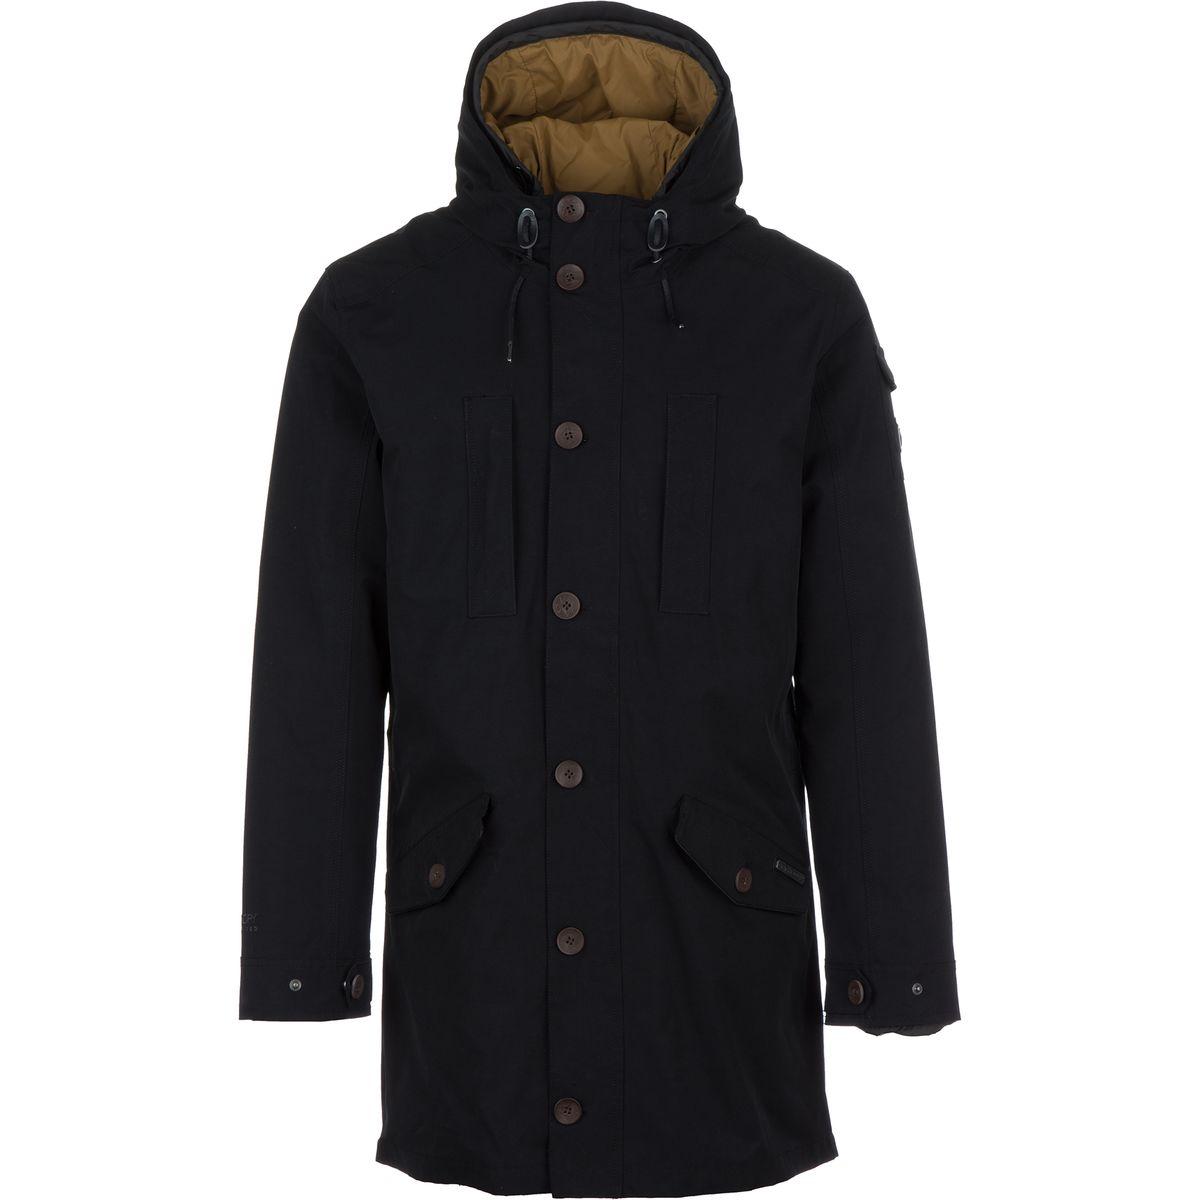 Craghoppers 364 3-In-1 Hooded Jacket - Men